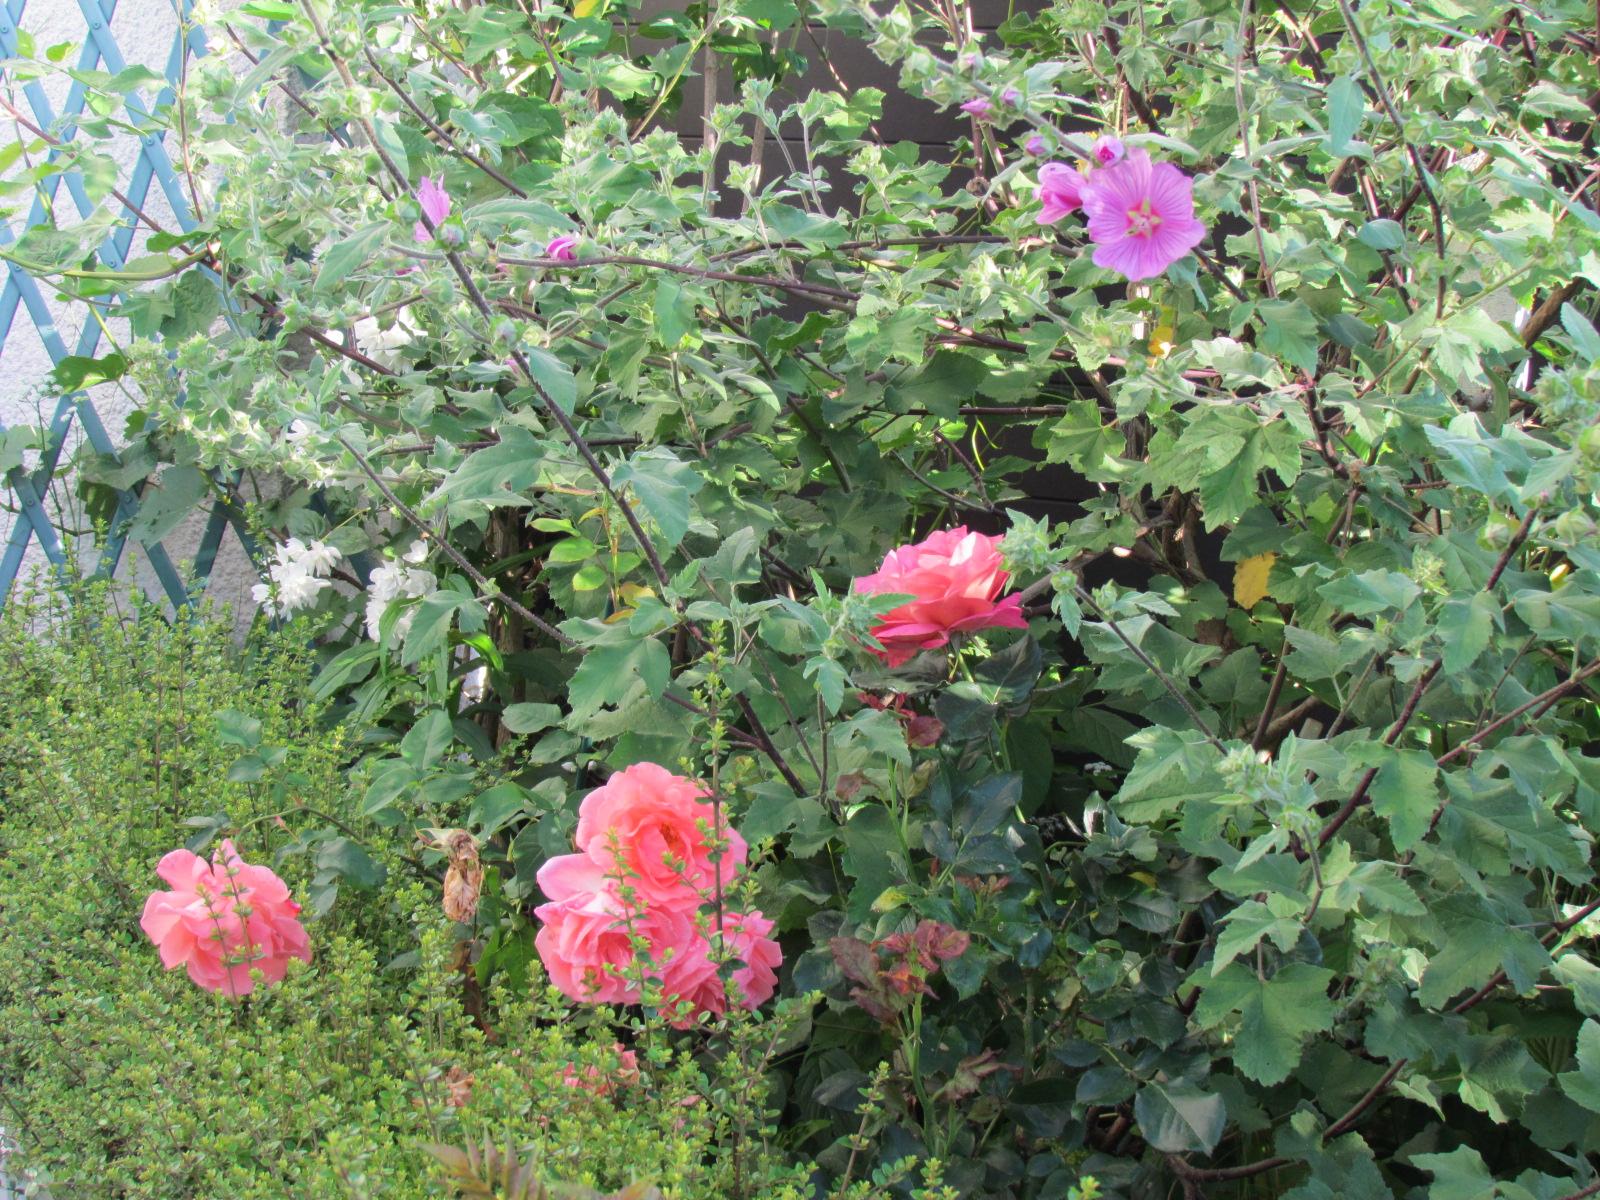 mon jardinet 2018 Dimanc15